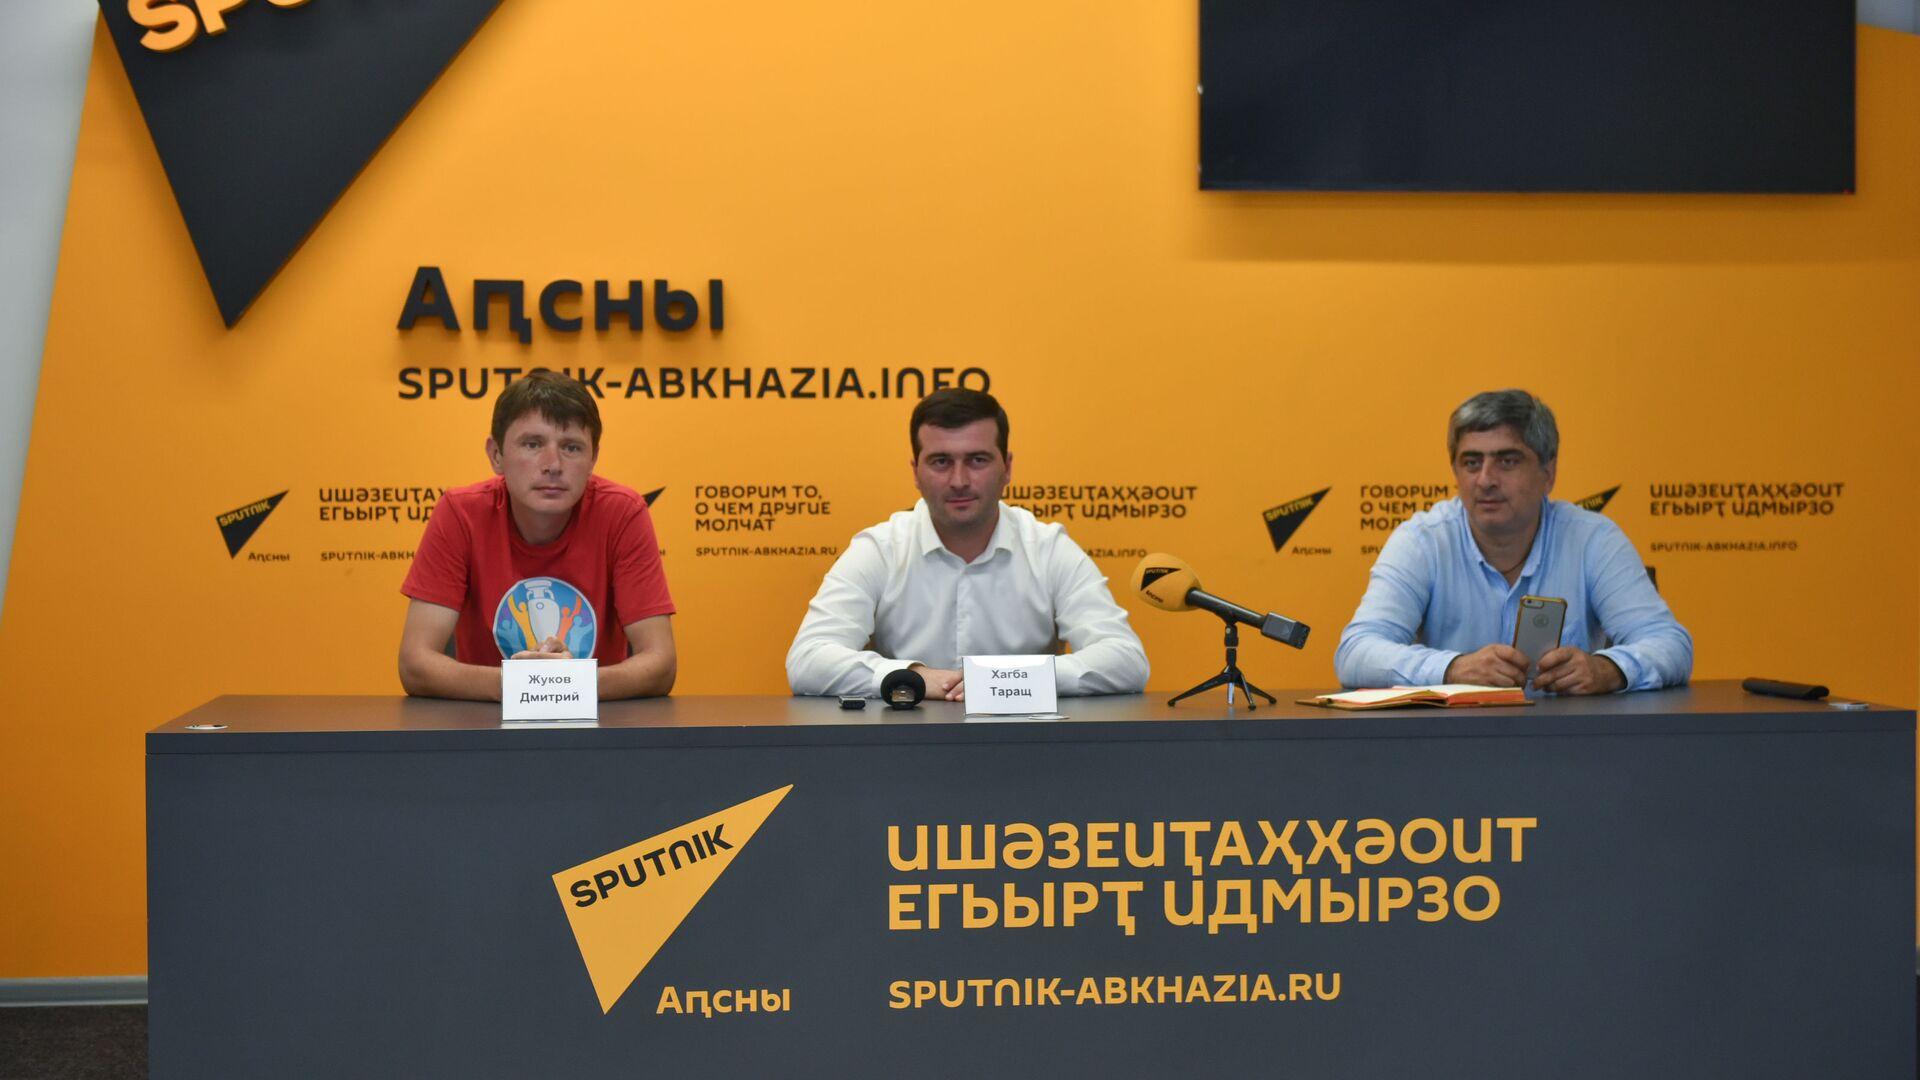 Пресс-конференция по футболу  - Sputnik Абхазия, 1920, 31.08.2021